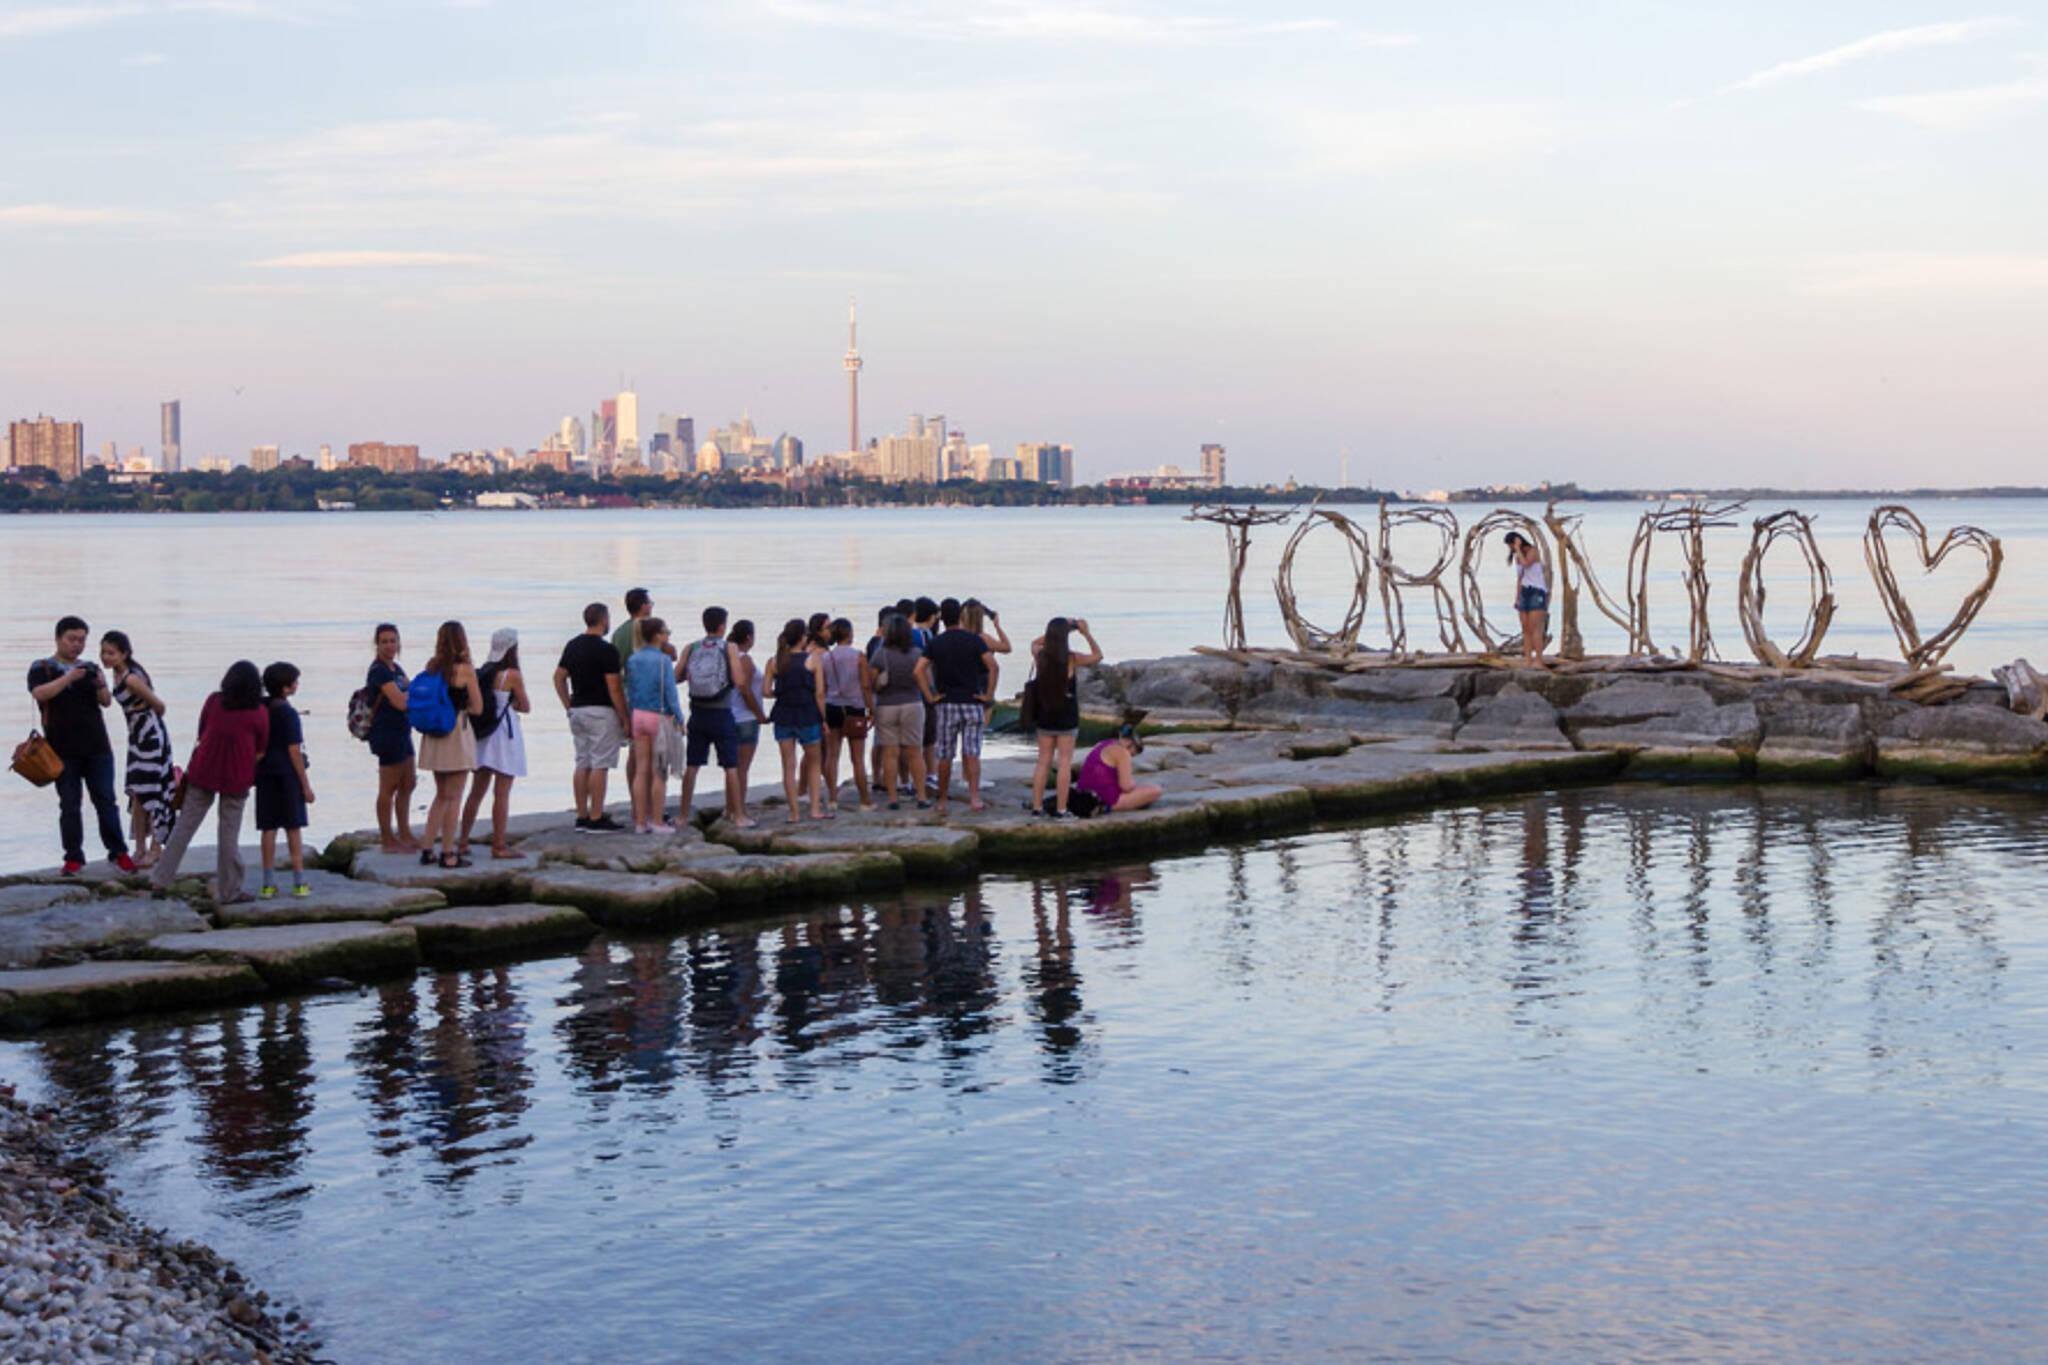 Toronto international tourists